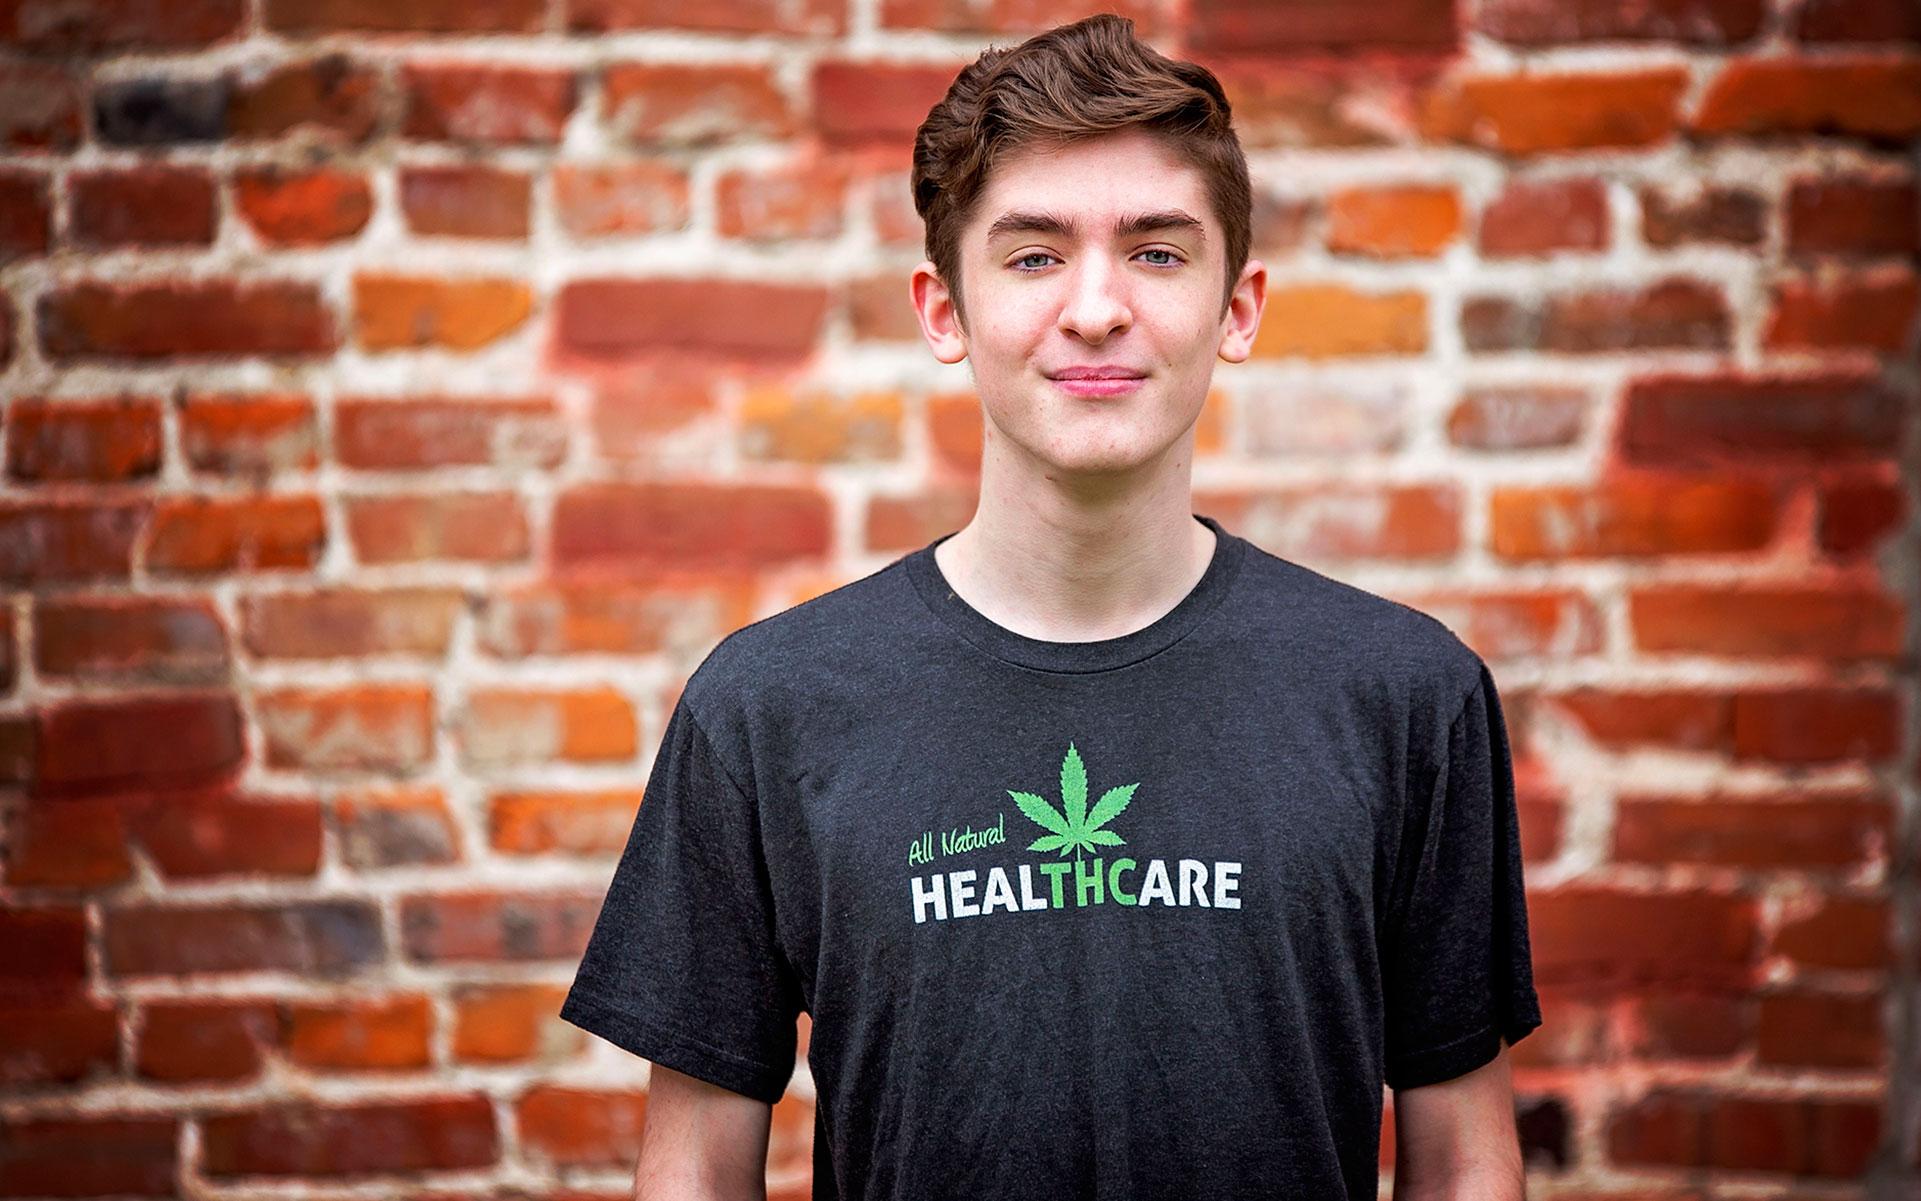 medical marijuana patient, children who medicate with cannabis, children and marijuana